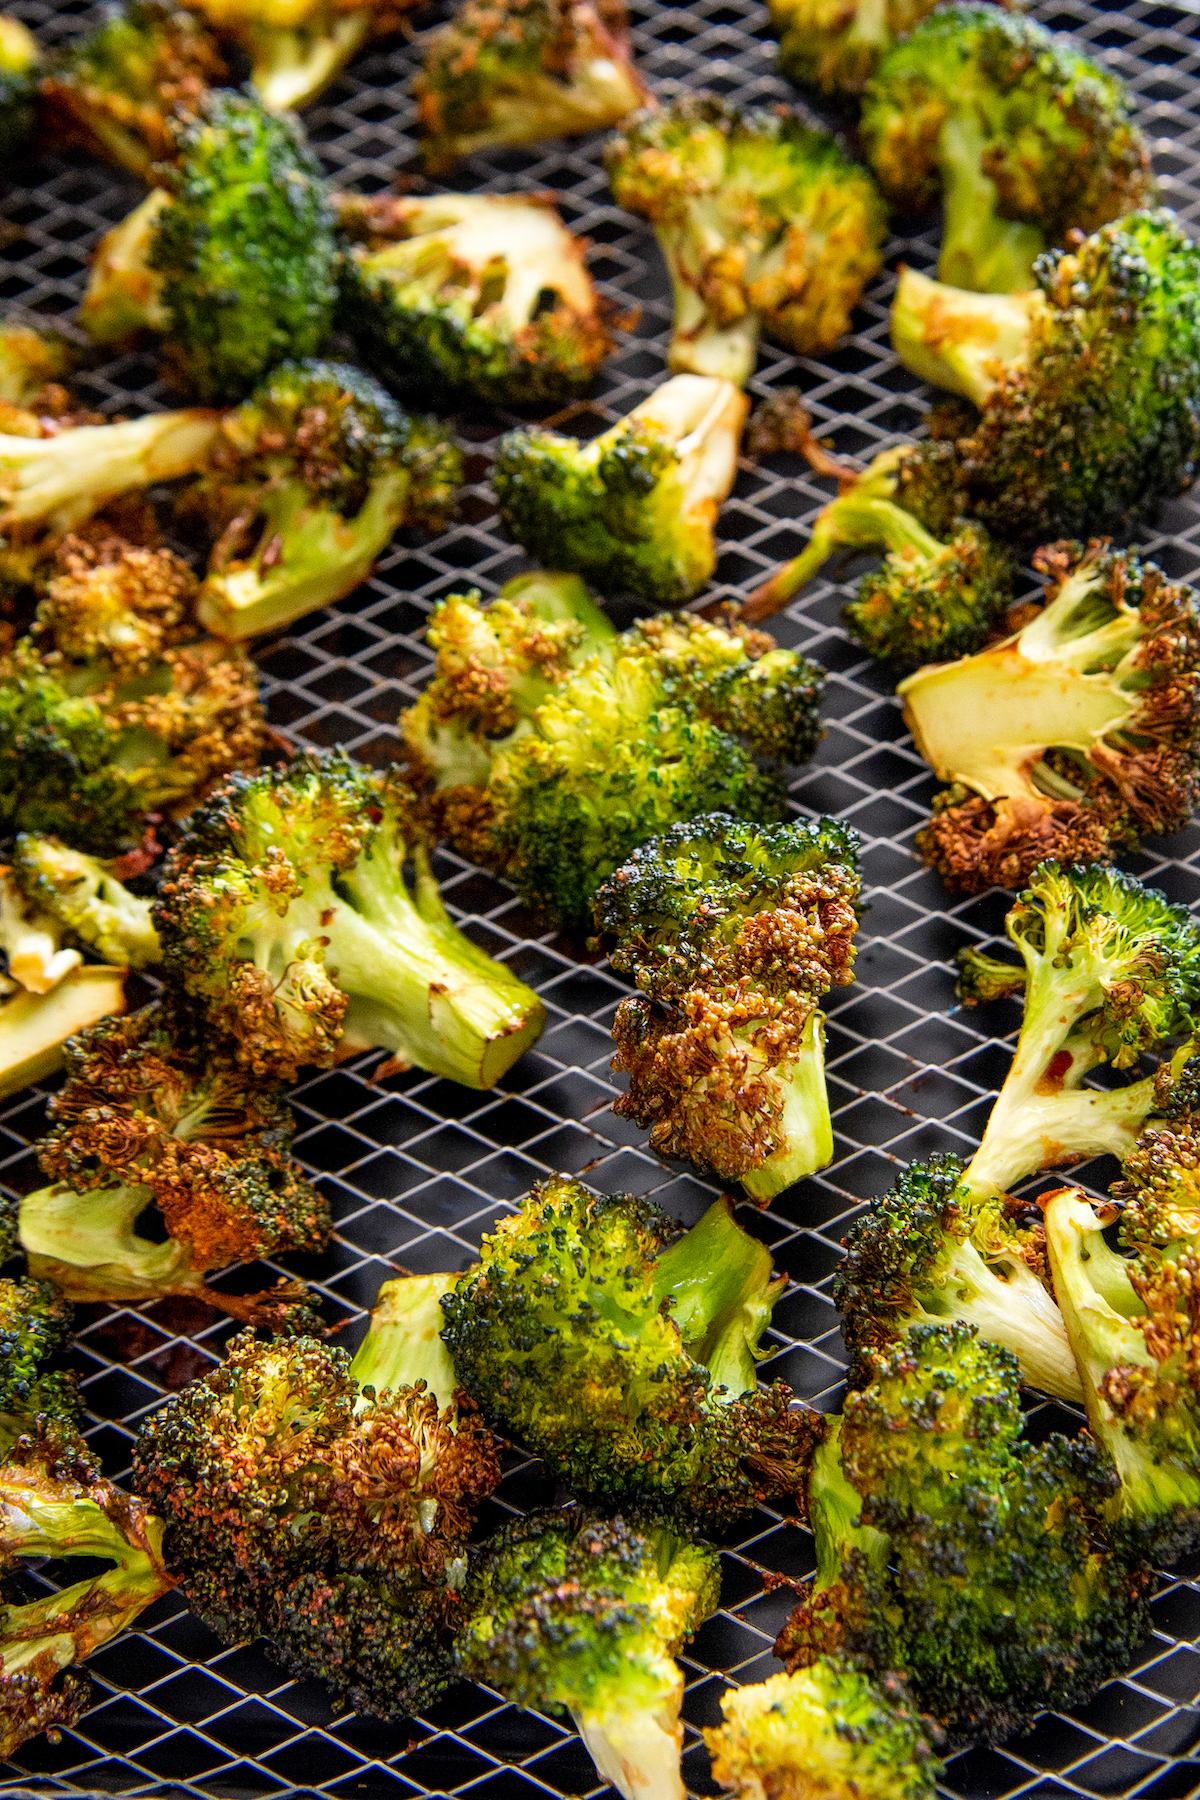 Asian roasted broccoli on an air fryer tray.